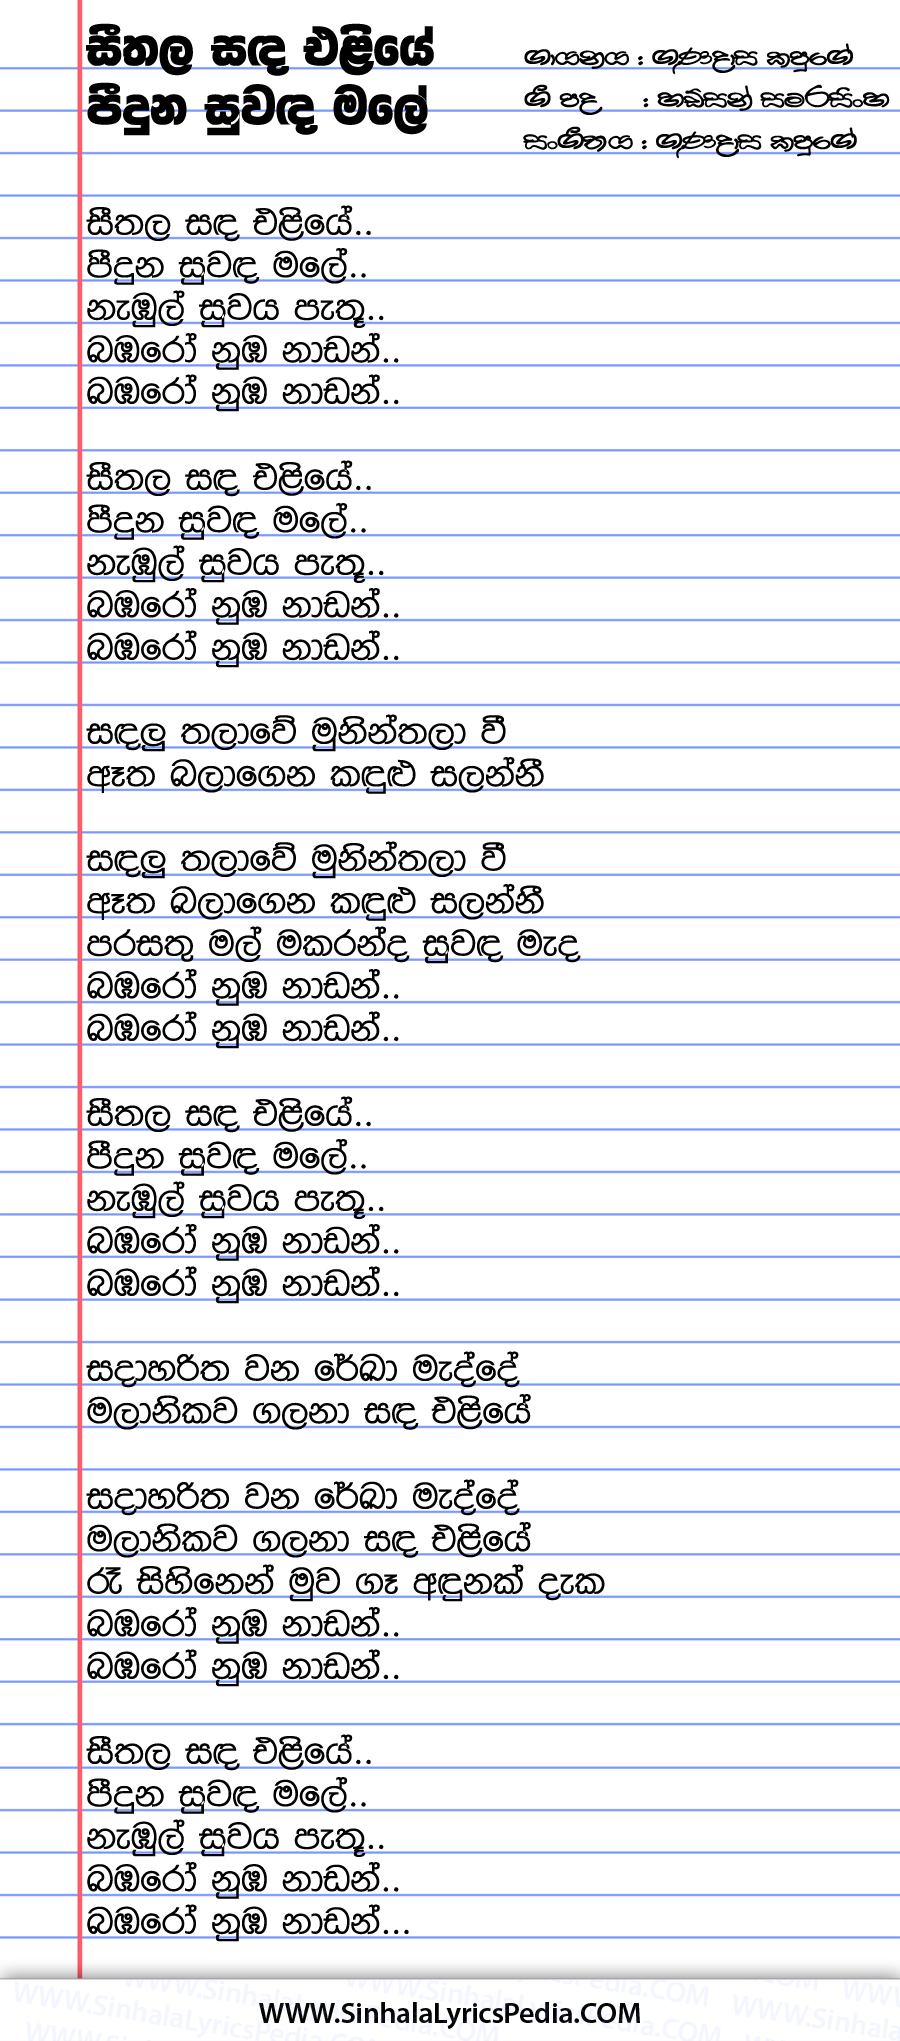 Seethala Sanda Eliye Pipunu Suwada Male Song Lyrics